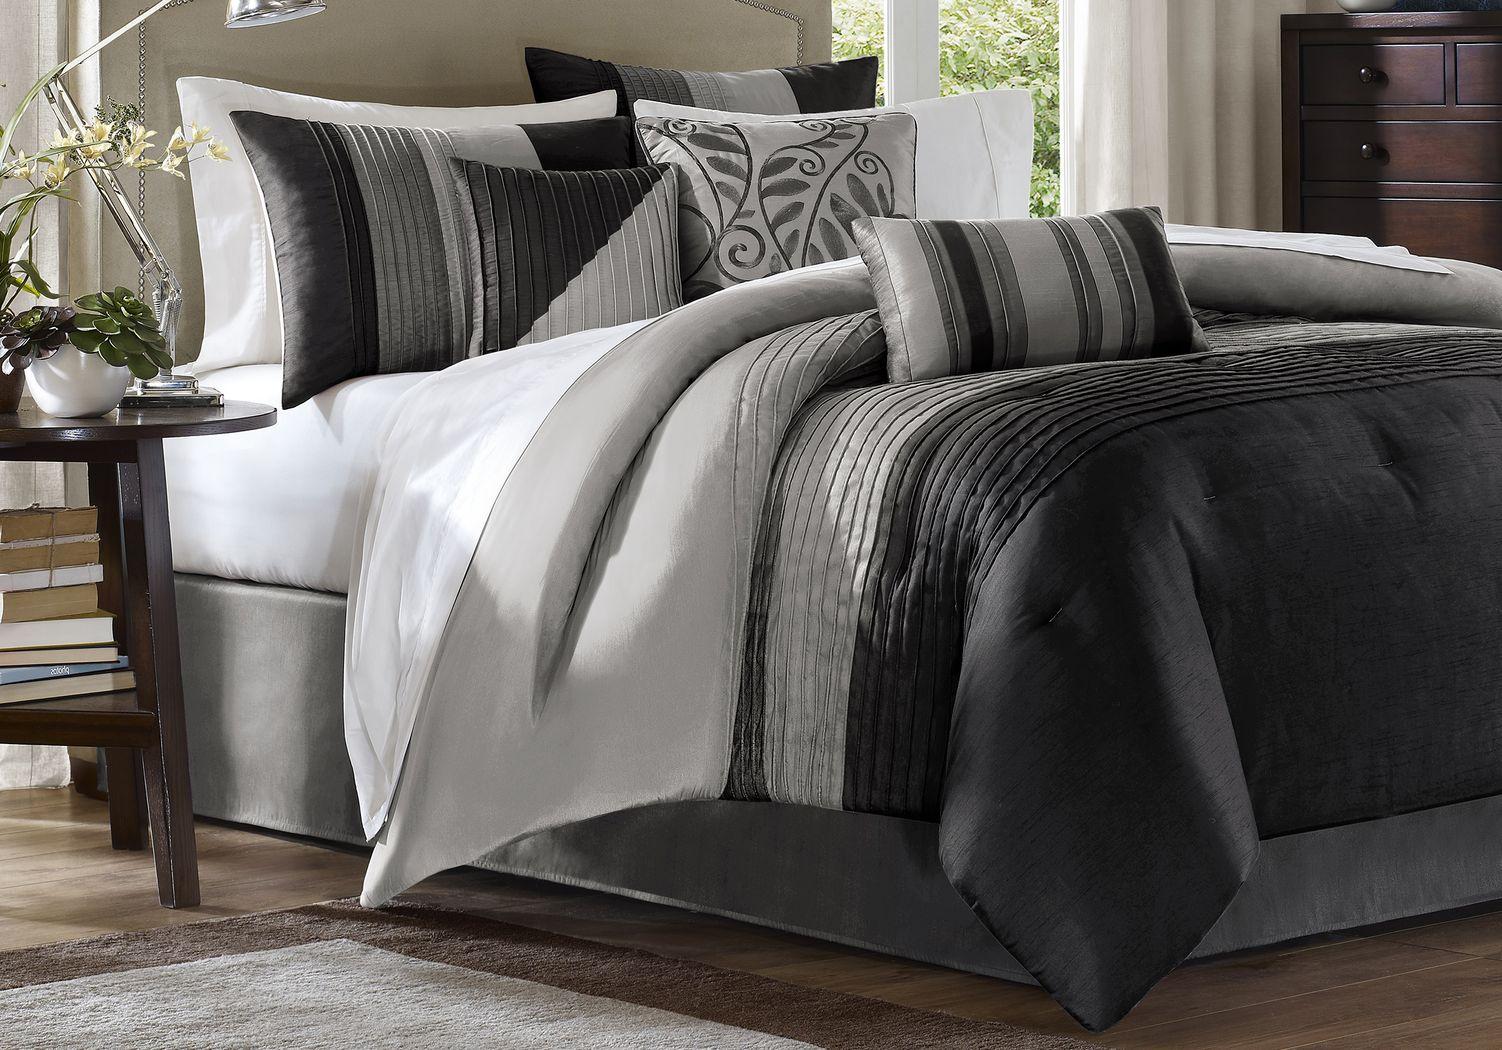 Brenna Black/Gray 7 Pc King Comforter Set